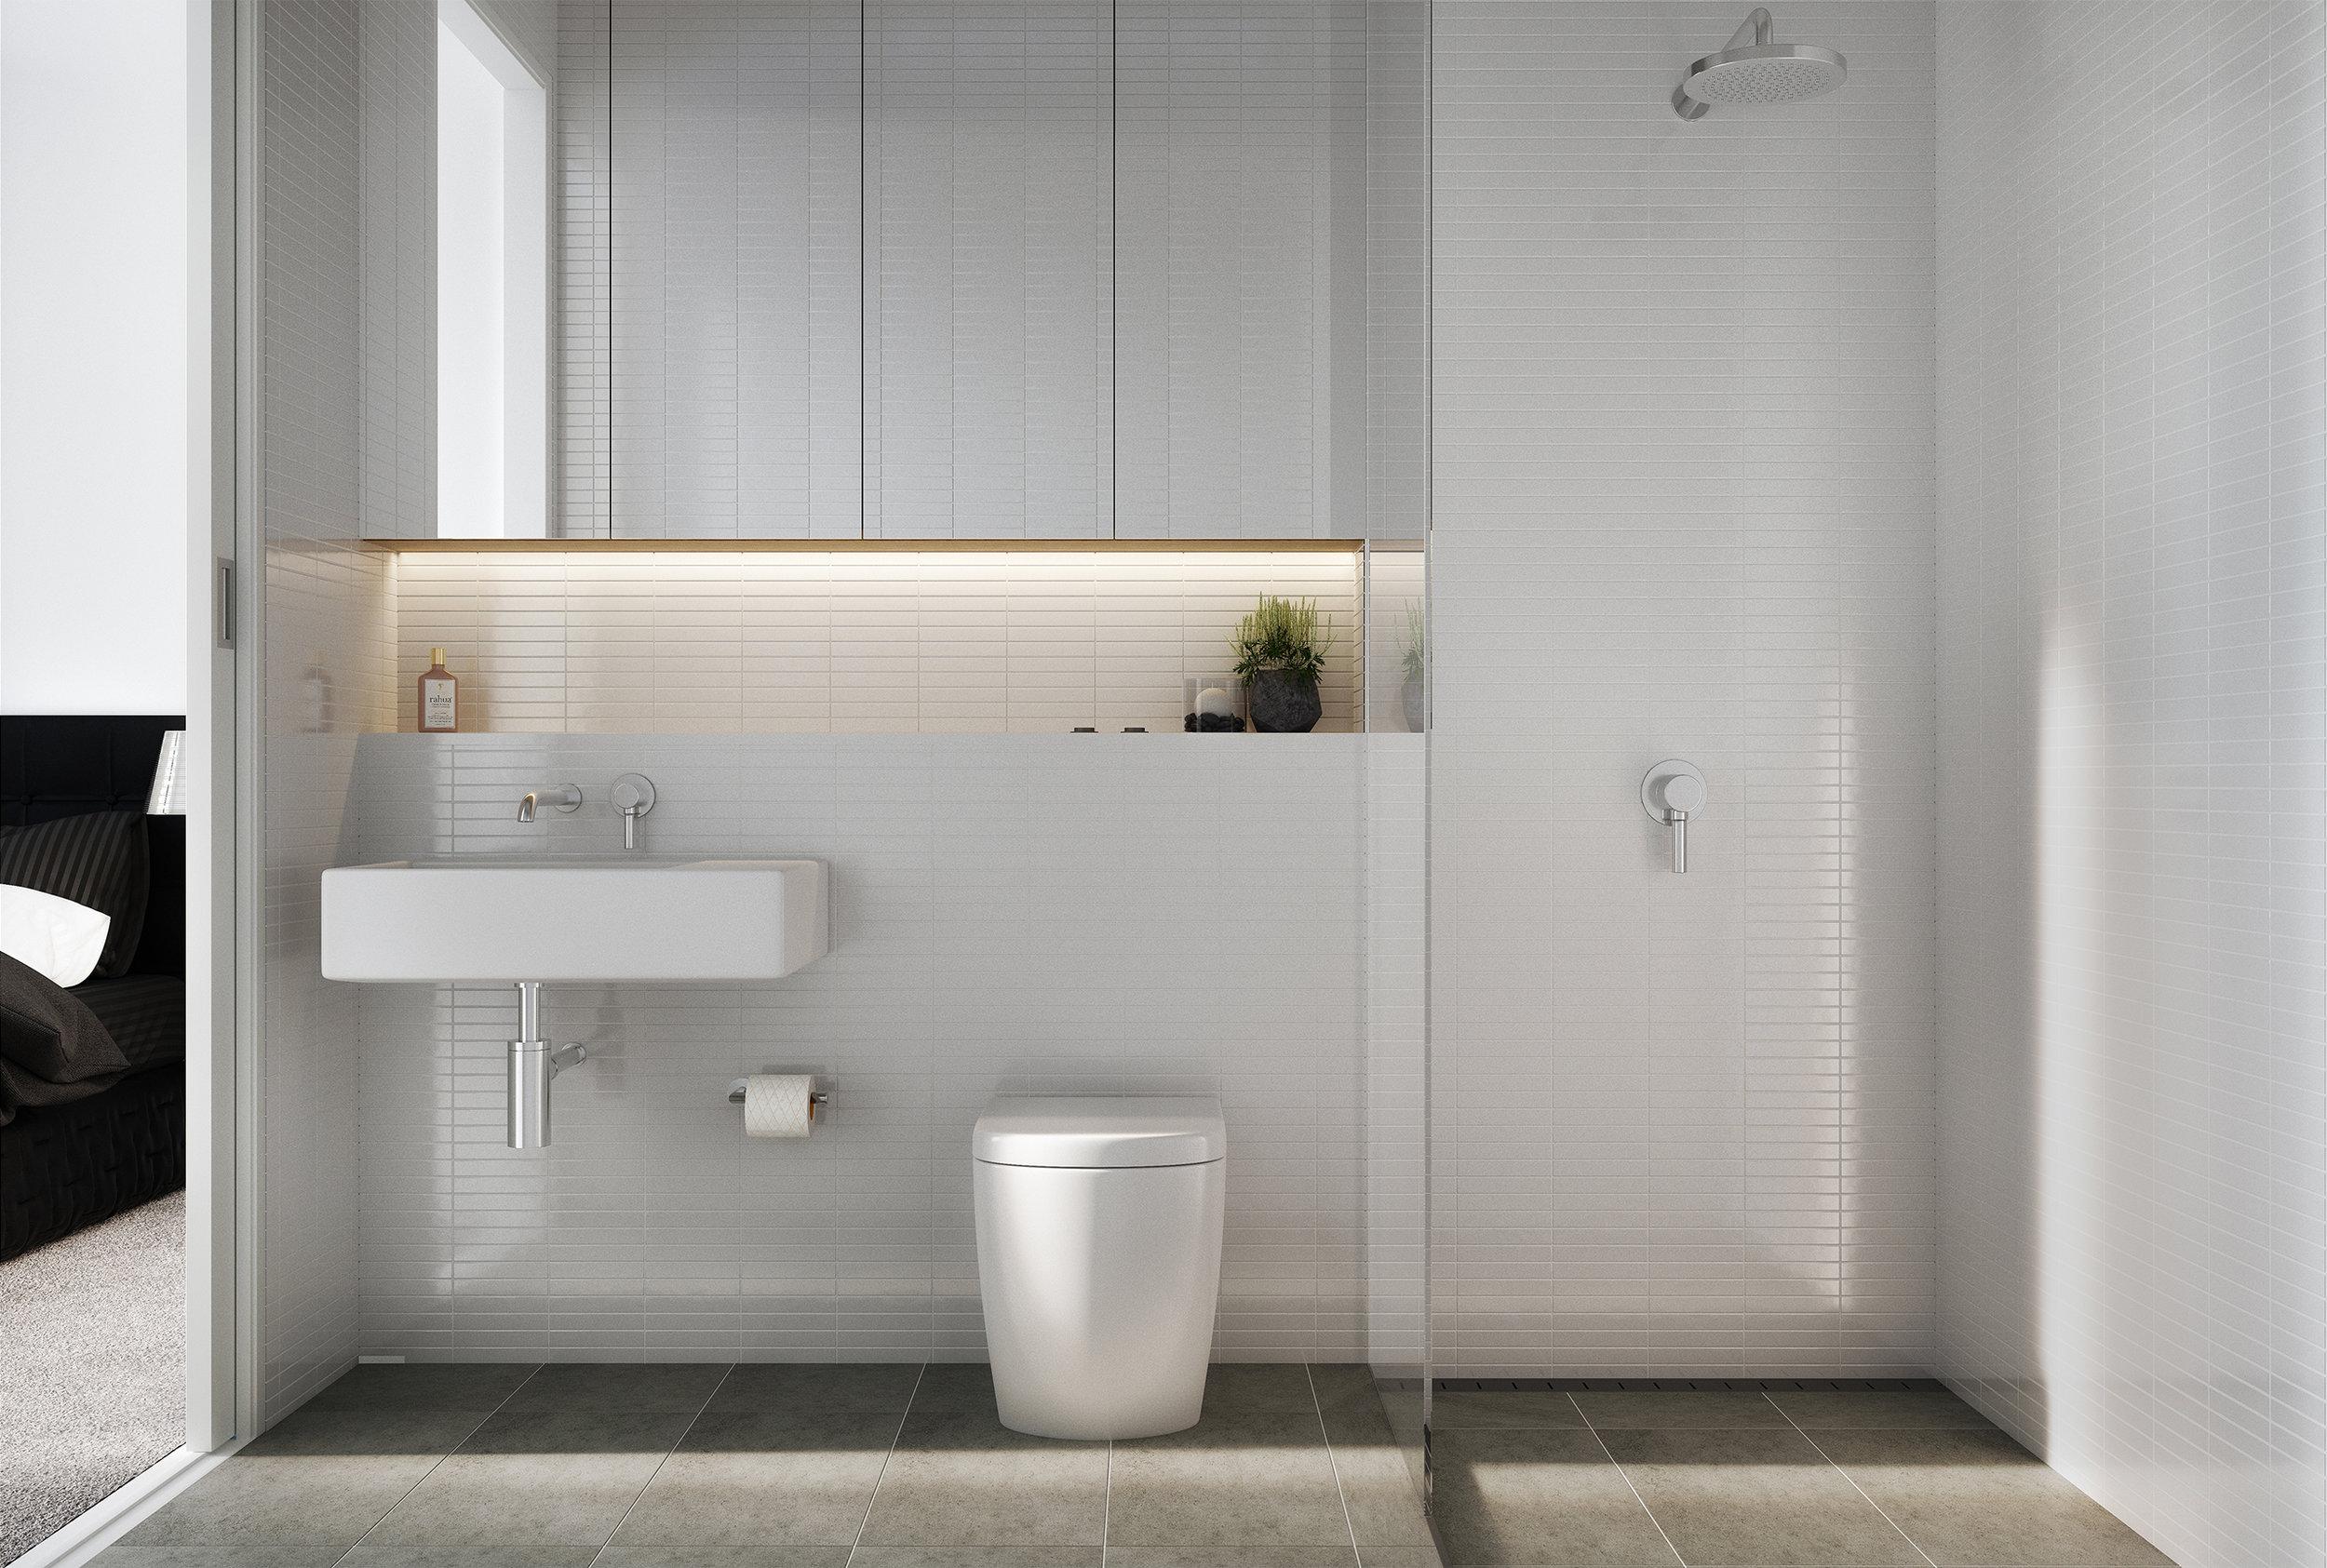 Eve St_CGI06_Bathroom_Final_web.jpg